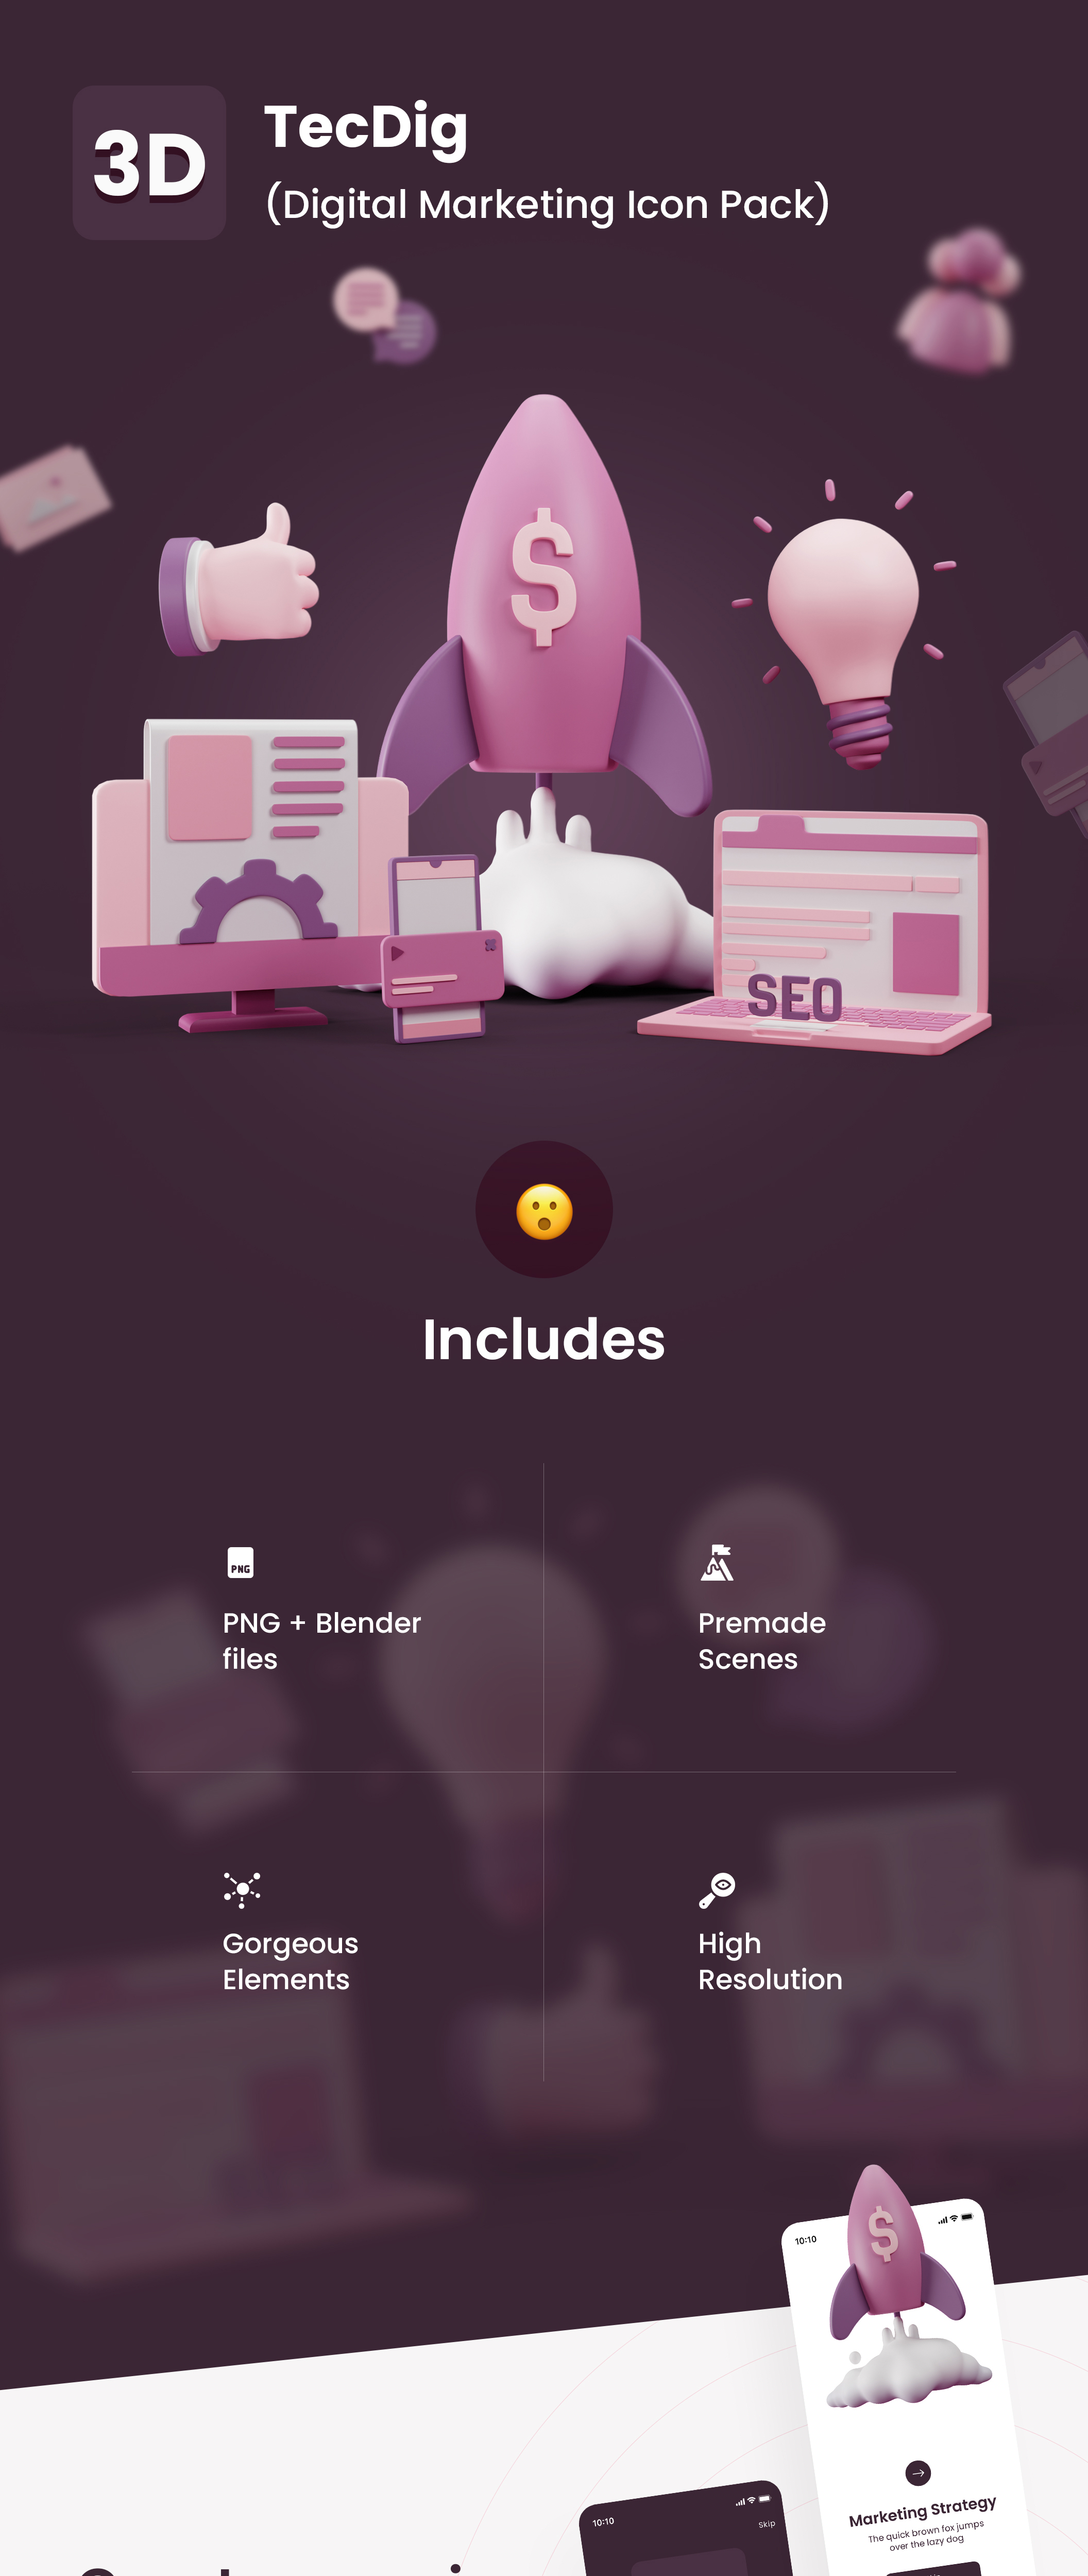 Premium 3D icon pack for digital marketing | TecDig Pro | Iqonic Design premium 3d icon pack for digital marketing TecDig Pro 3D f3 1627383159084